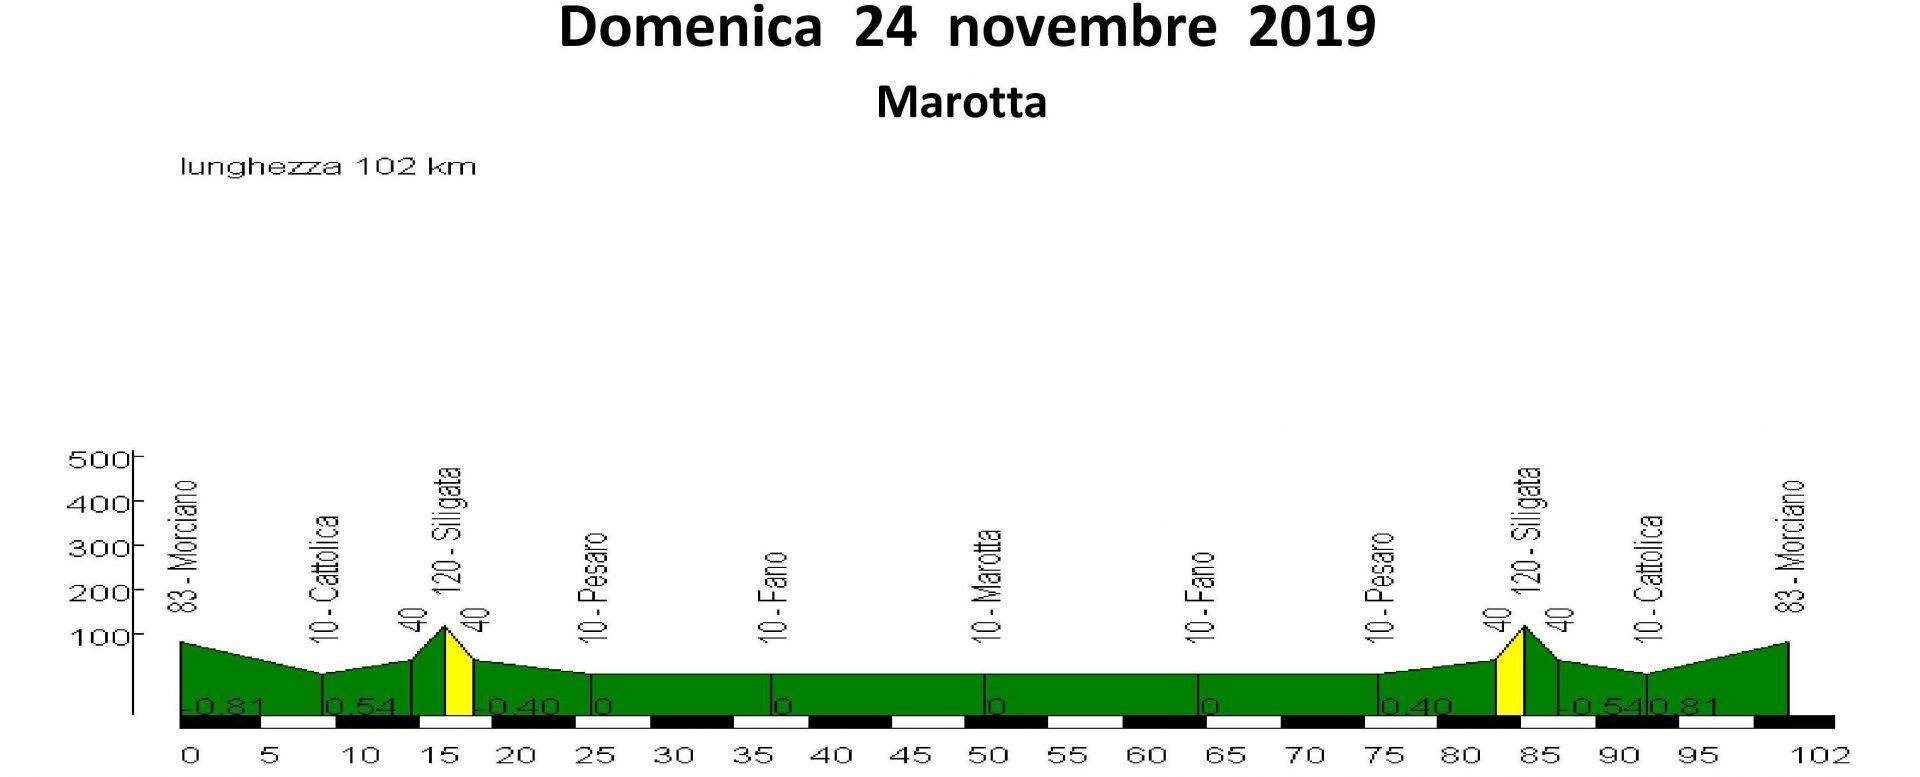 Domenica 24-nov-2019 Marotta